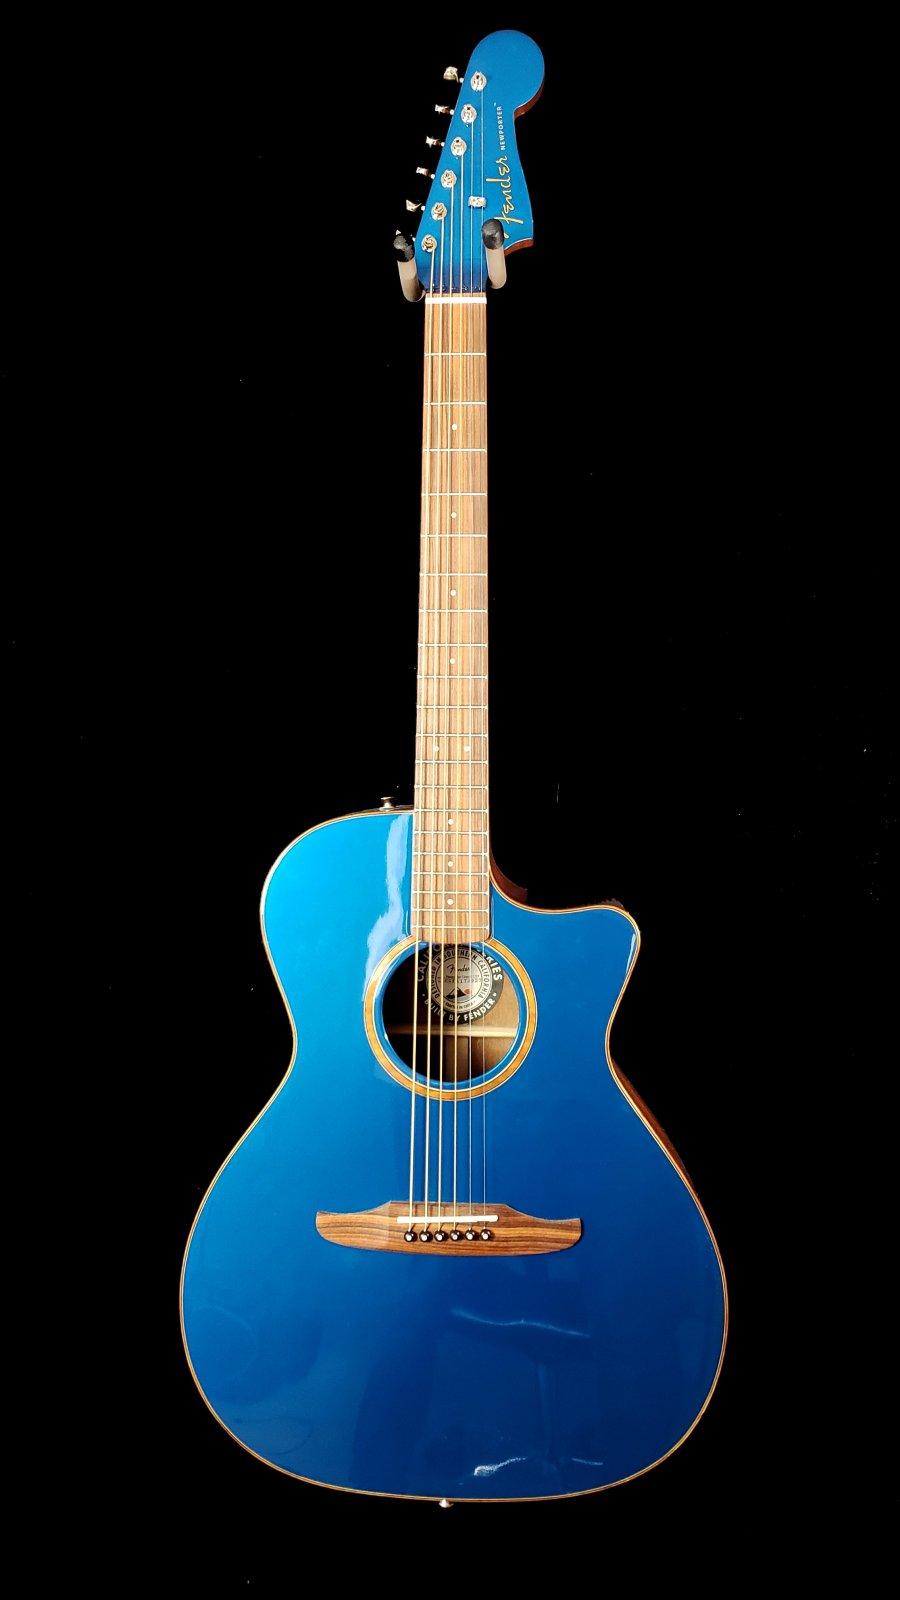 Fender Newporter Classic Cosmic Turquoise